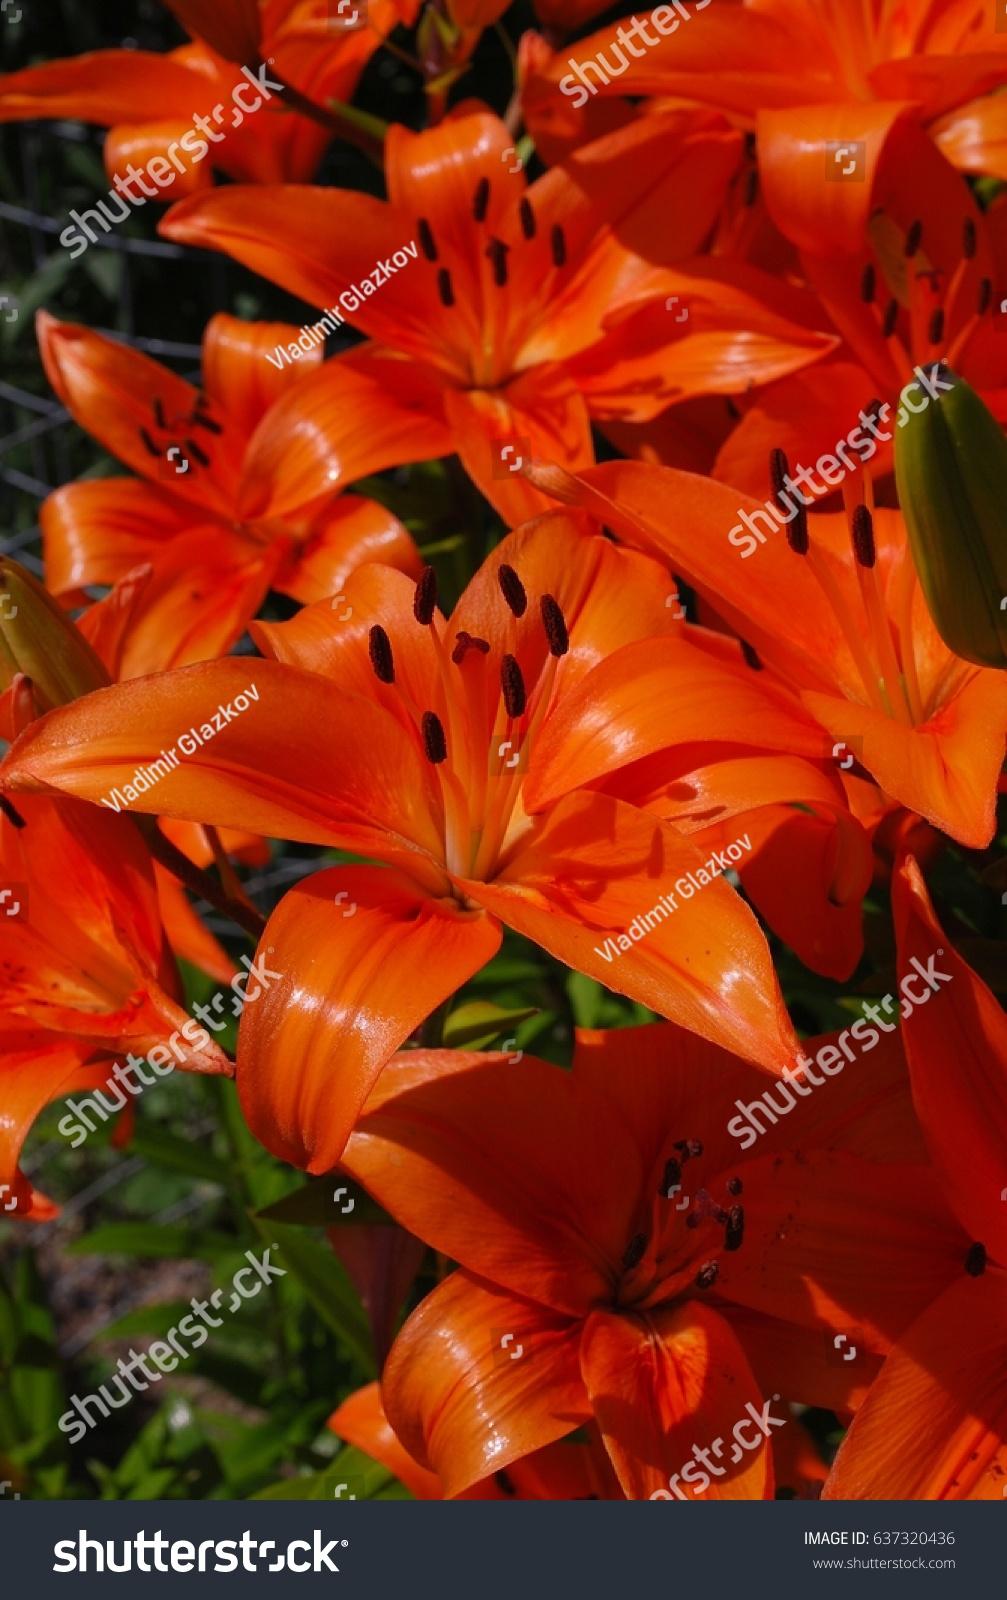 Tiger lily flower taken closeup ez canvas izmirmasajfo